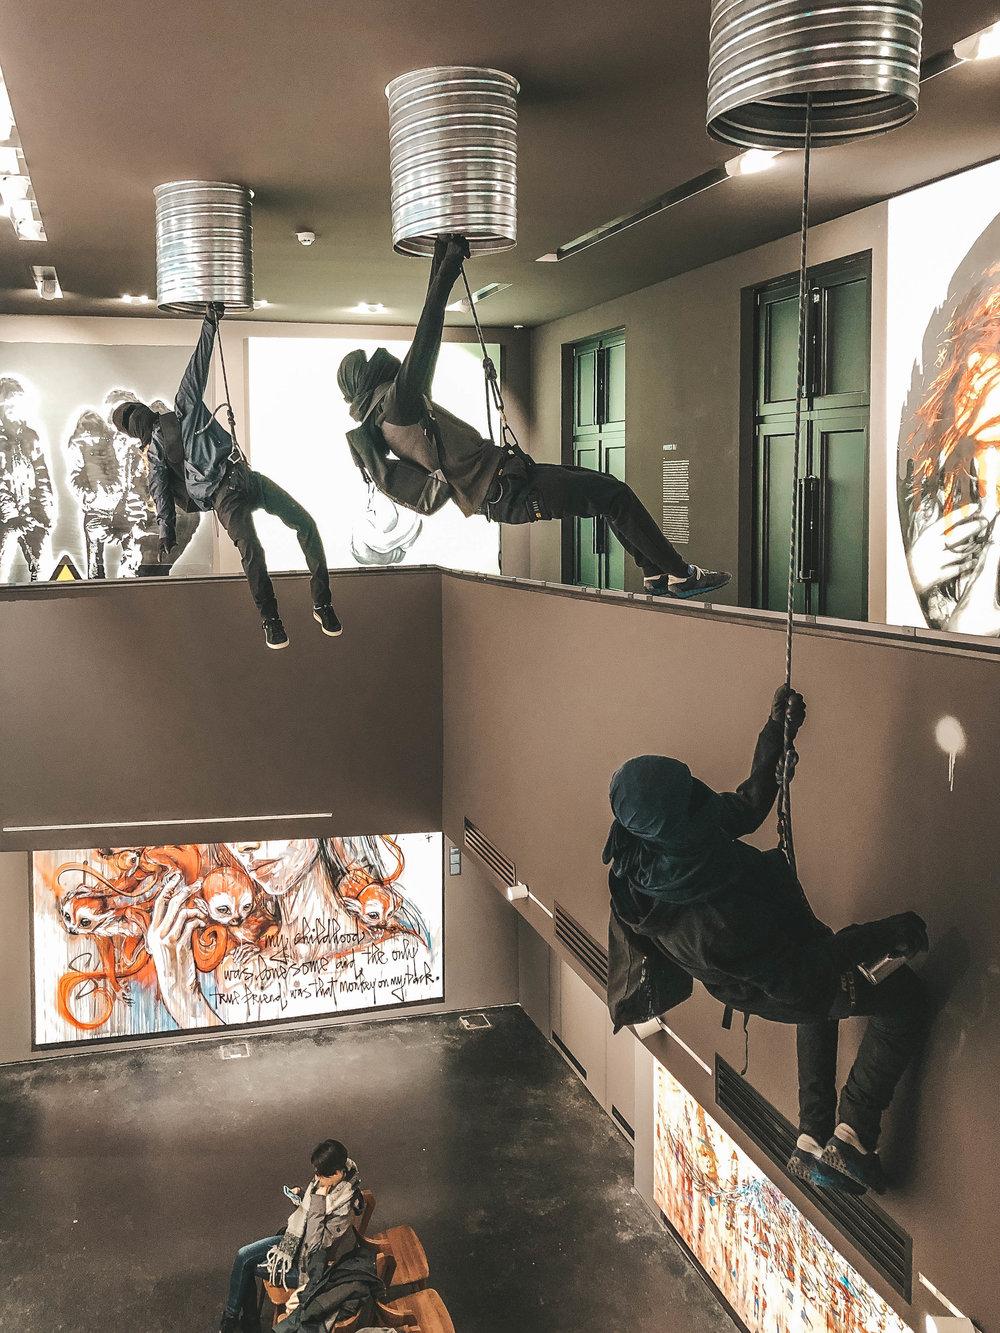 Berlin Street Art Museum